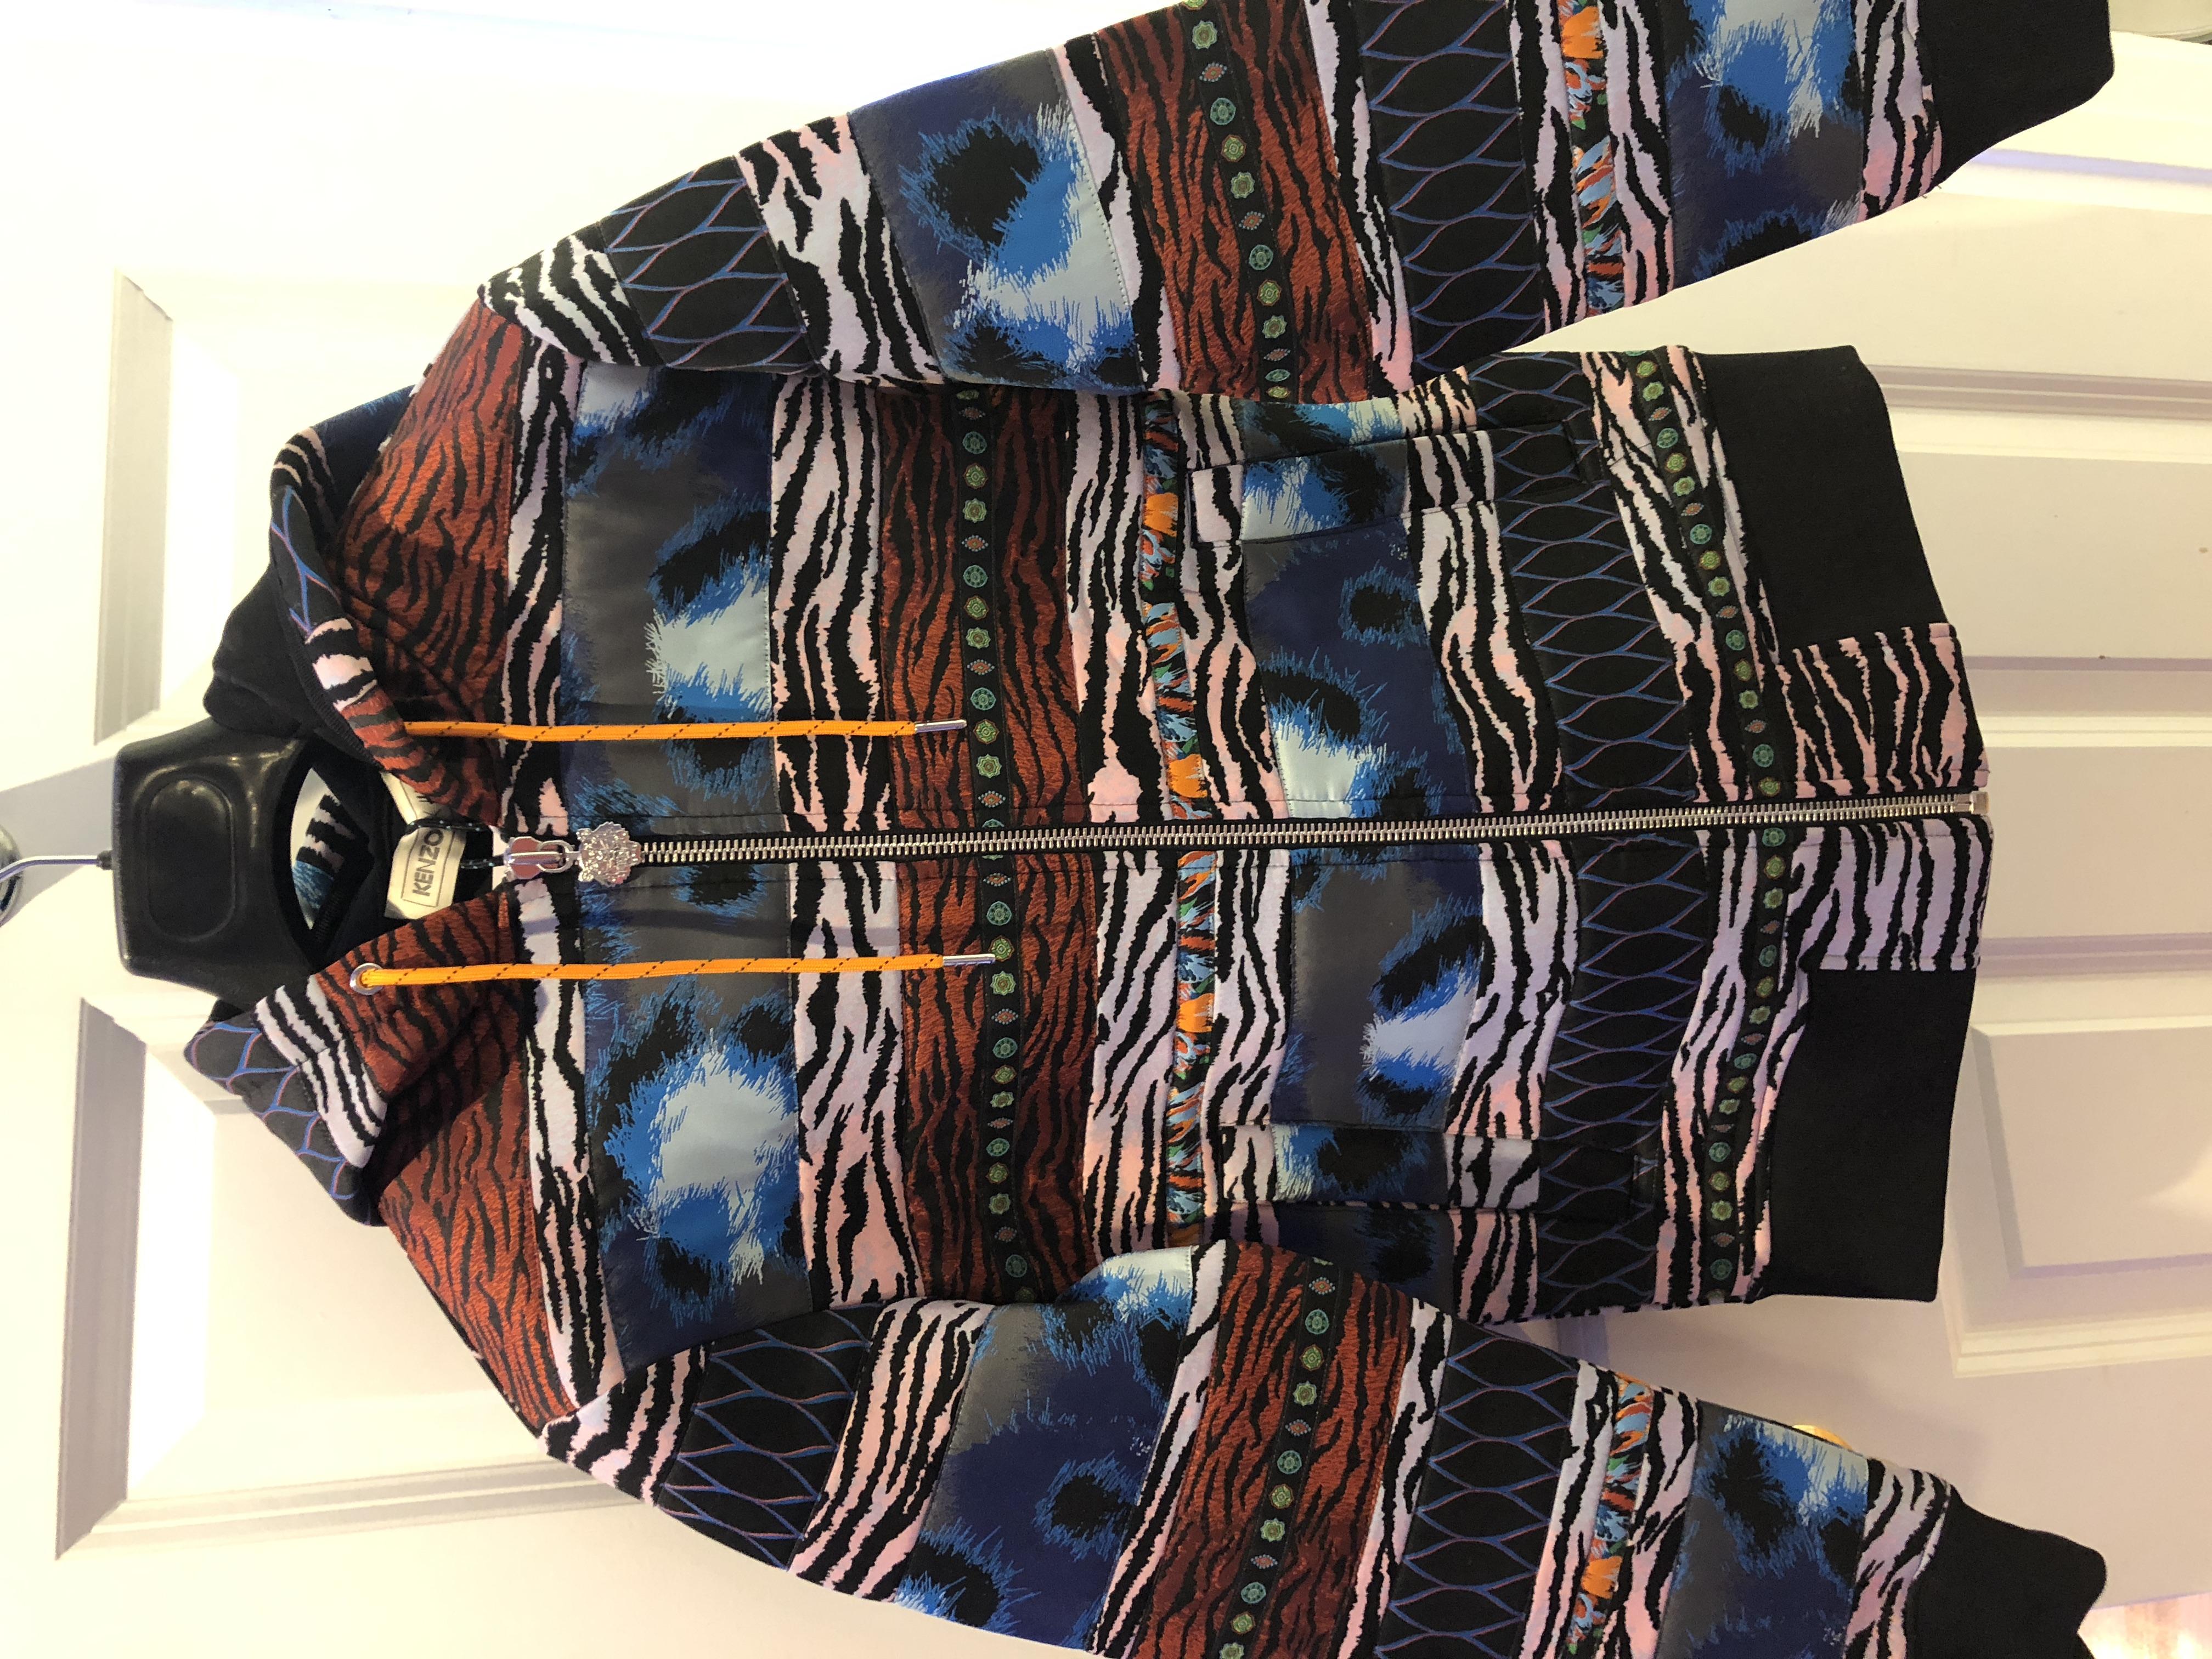 e739e8cc Kenzo Brand New Kenzo X Hm Multi-panel Hooded/hoodie Sweatshirt Xs | Grailed